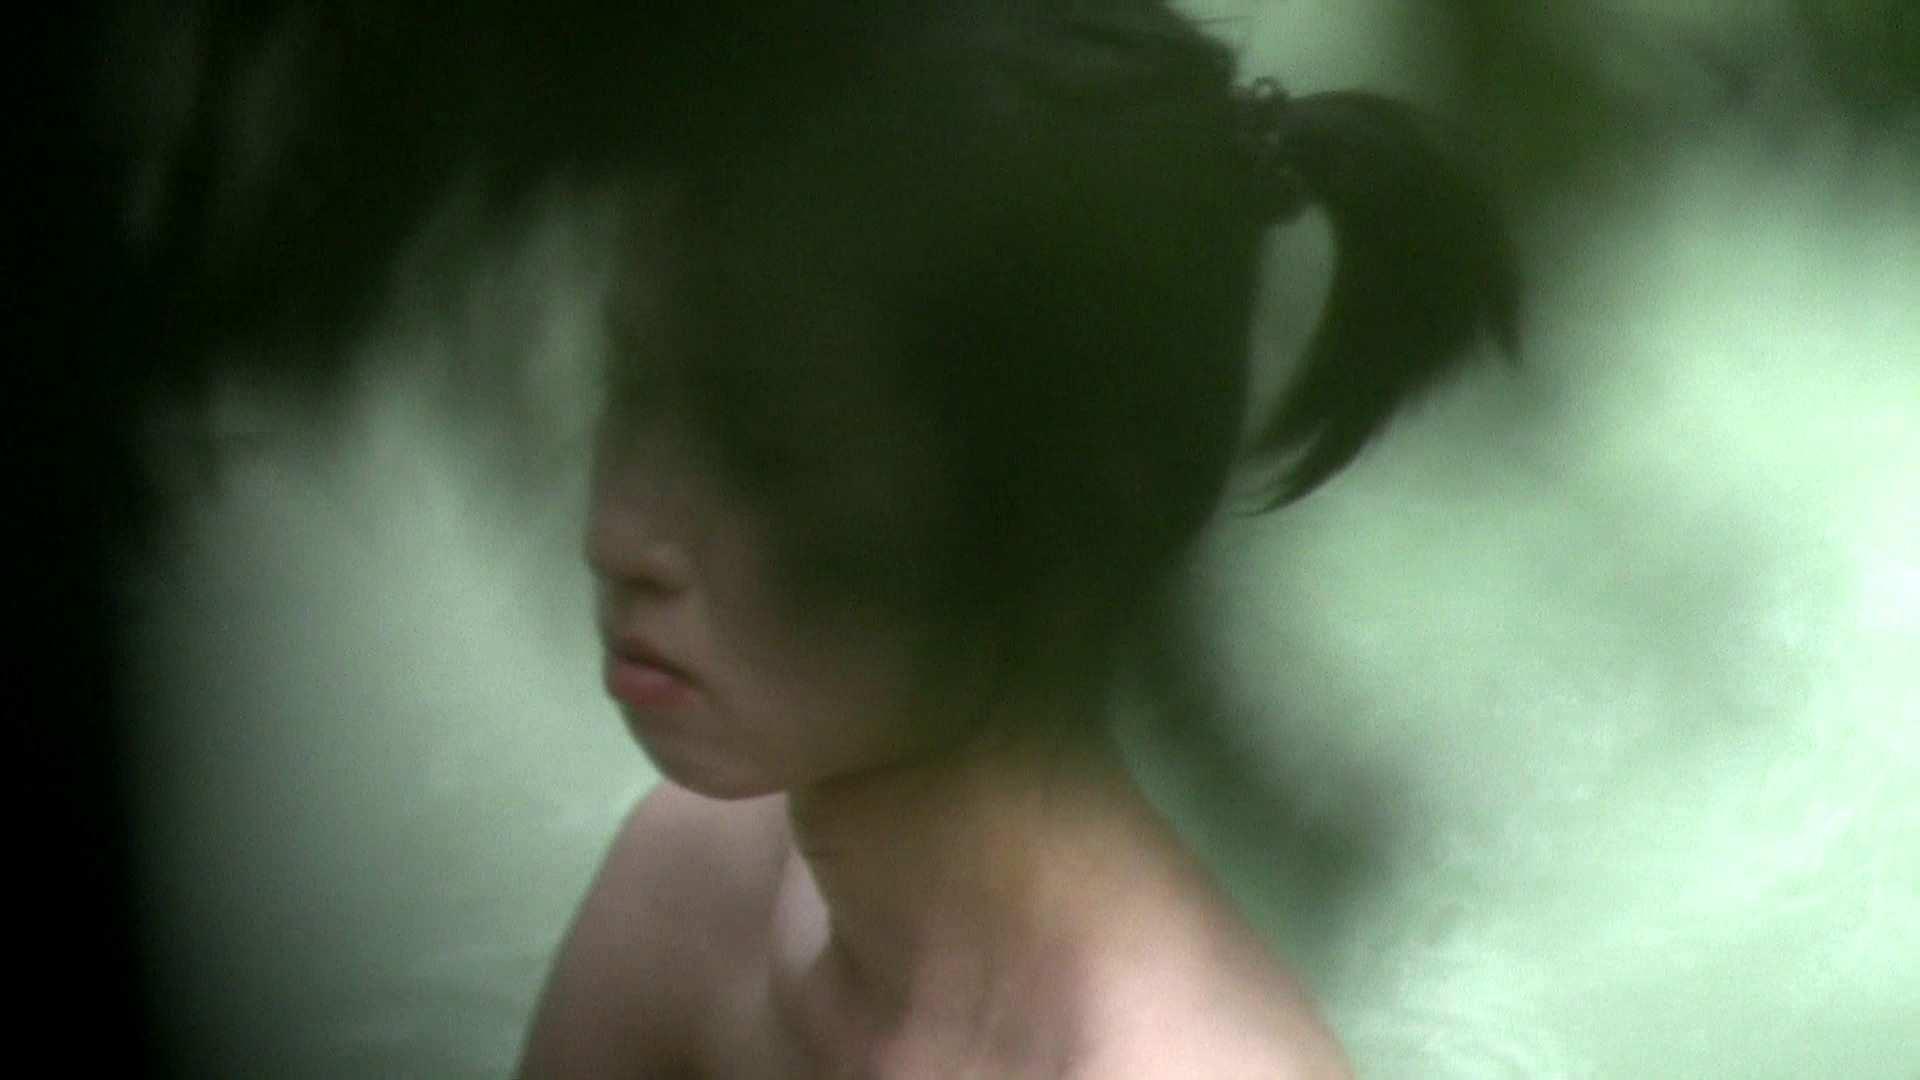 Aquaな露天風呂Vol.656 露天風呂編 | 盗撮シリーズ  91PIX 87